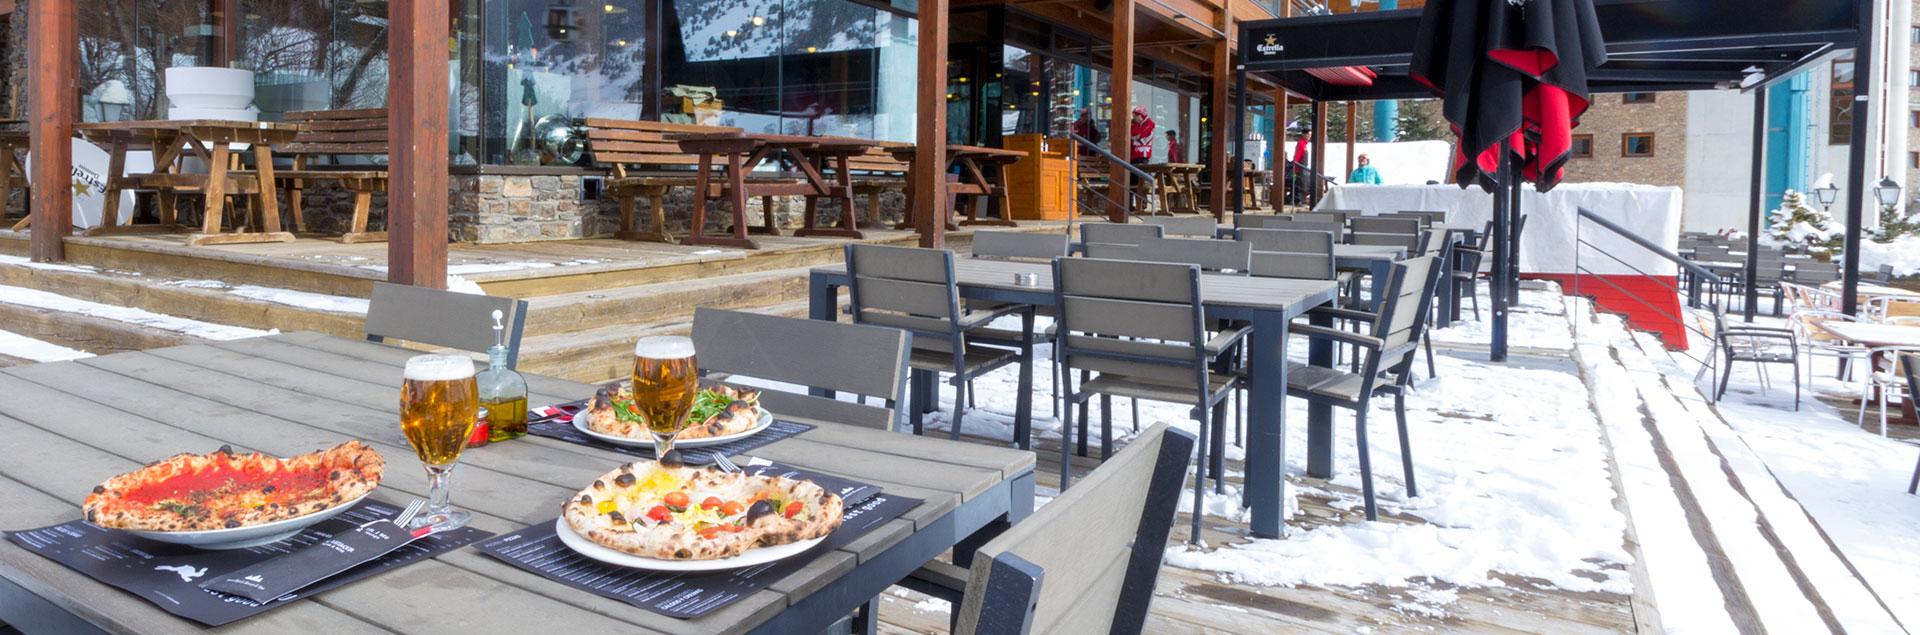 Sol i Neu Pizzería | SPORT HOTELS ANDORRA